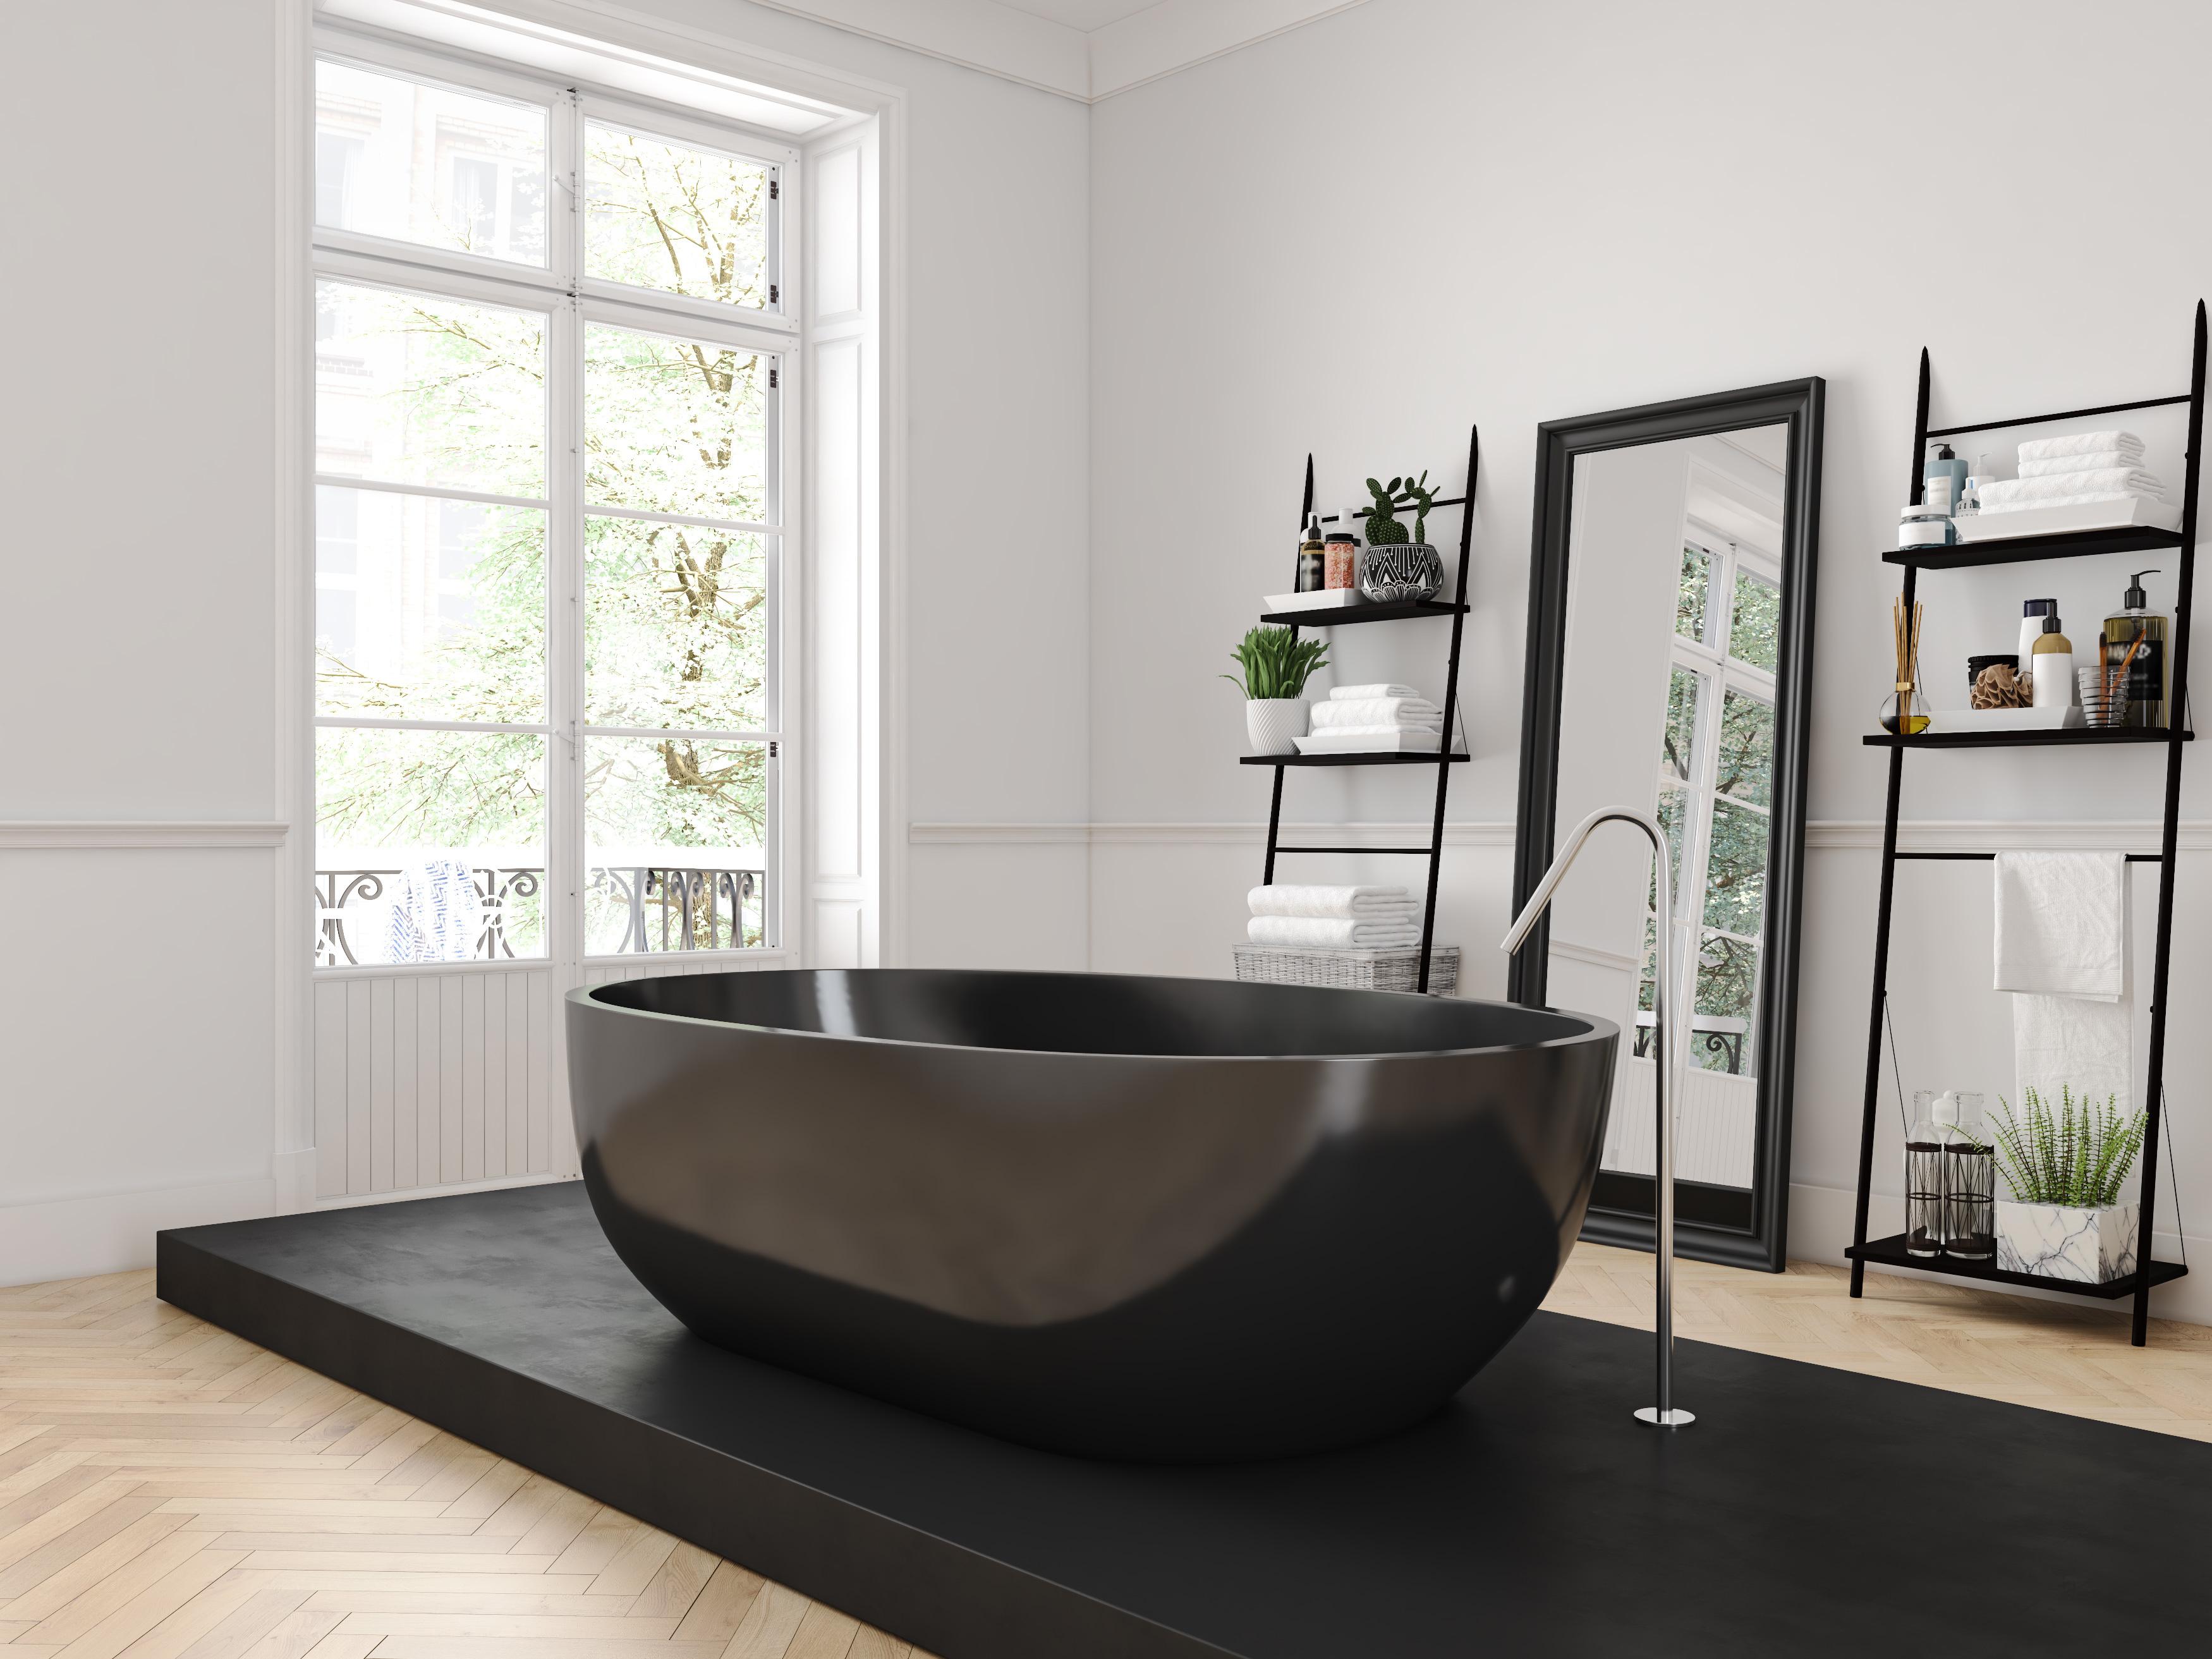 classic luxury bathroom. 3d rendering